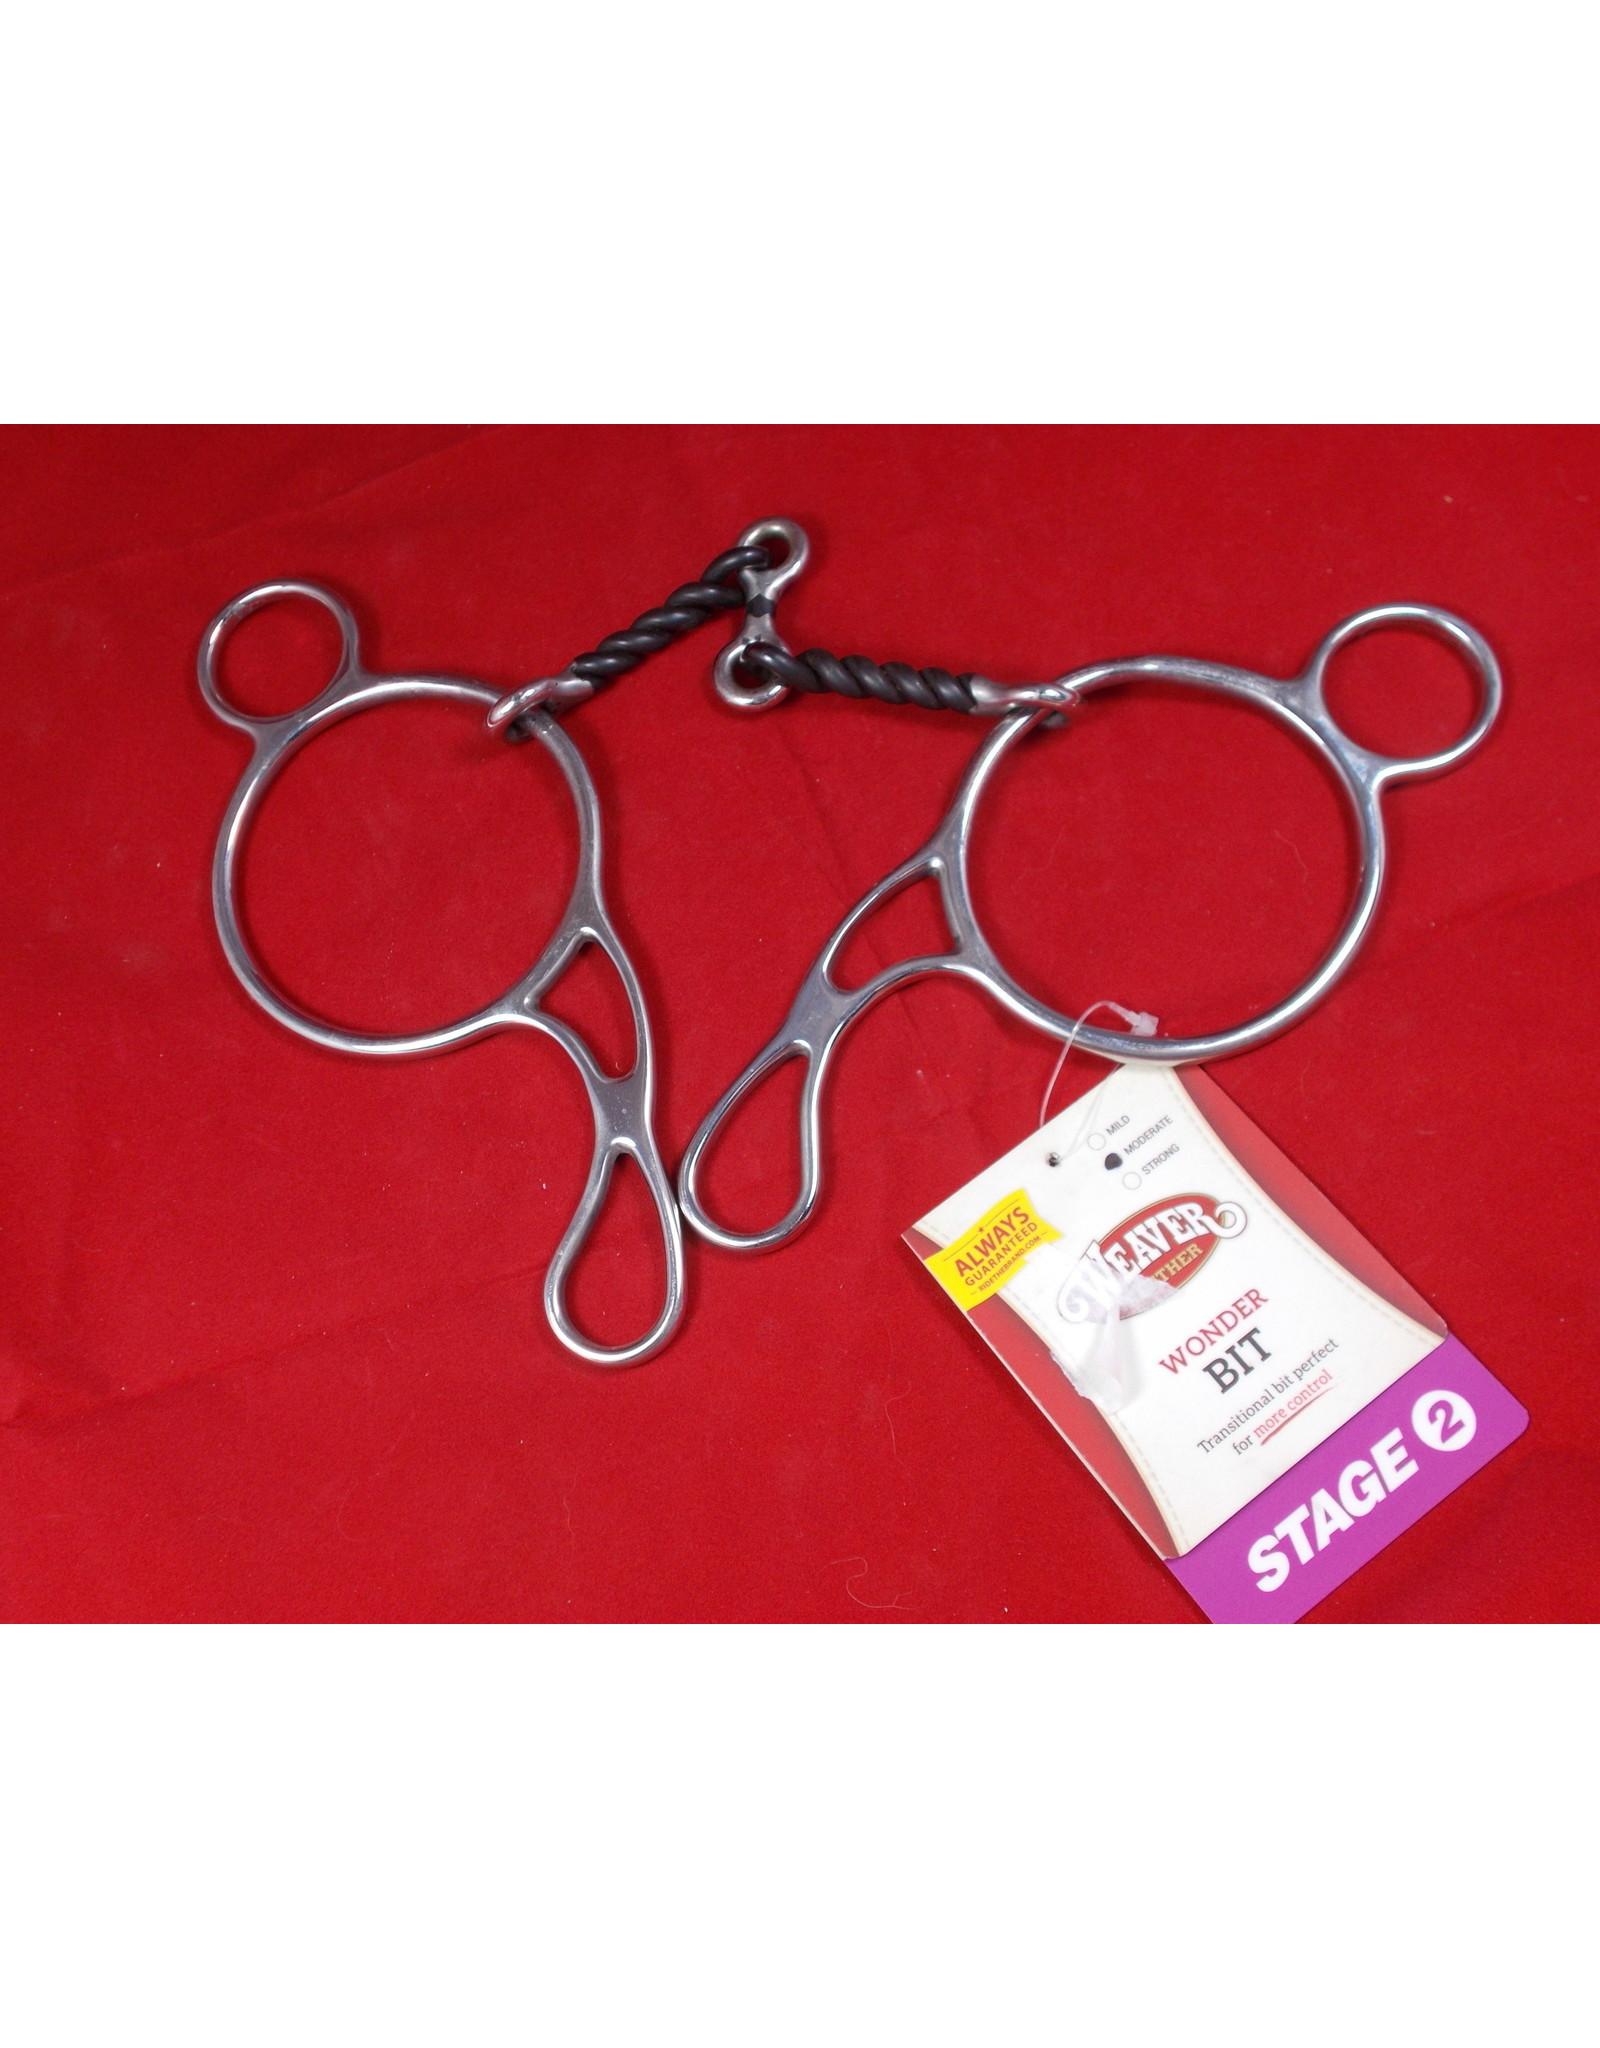 BIT* Wonder - Stage 2 - Dogbone Twisted Wire - #25-5891